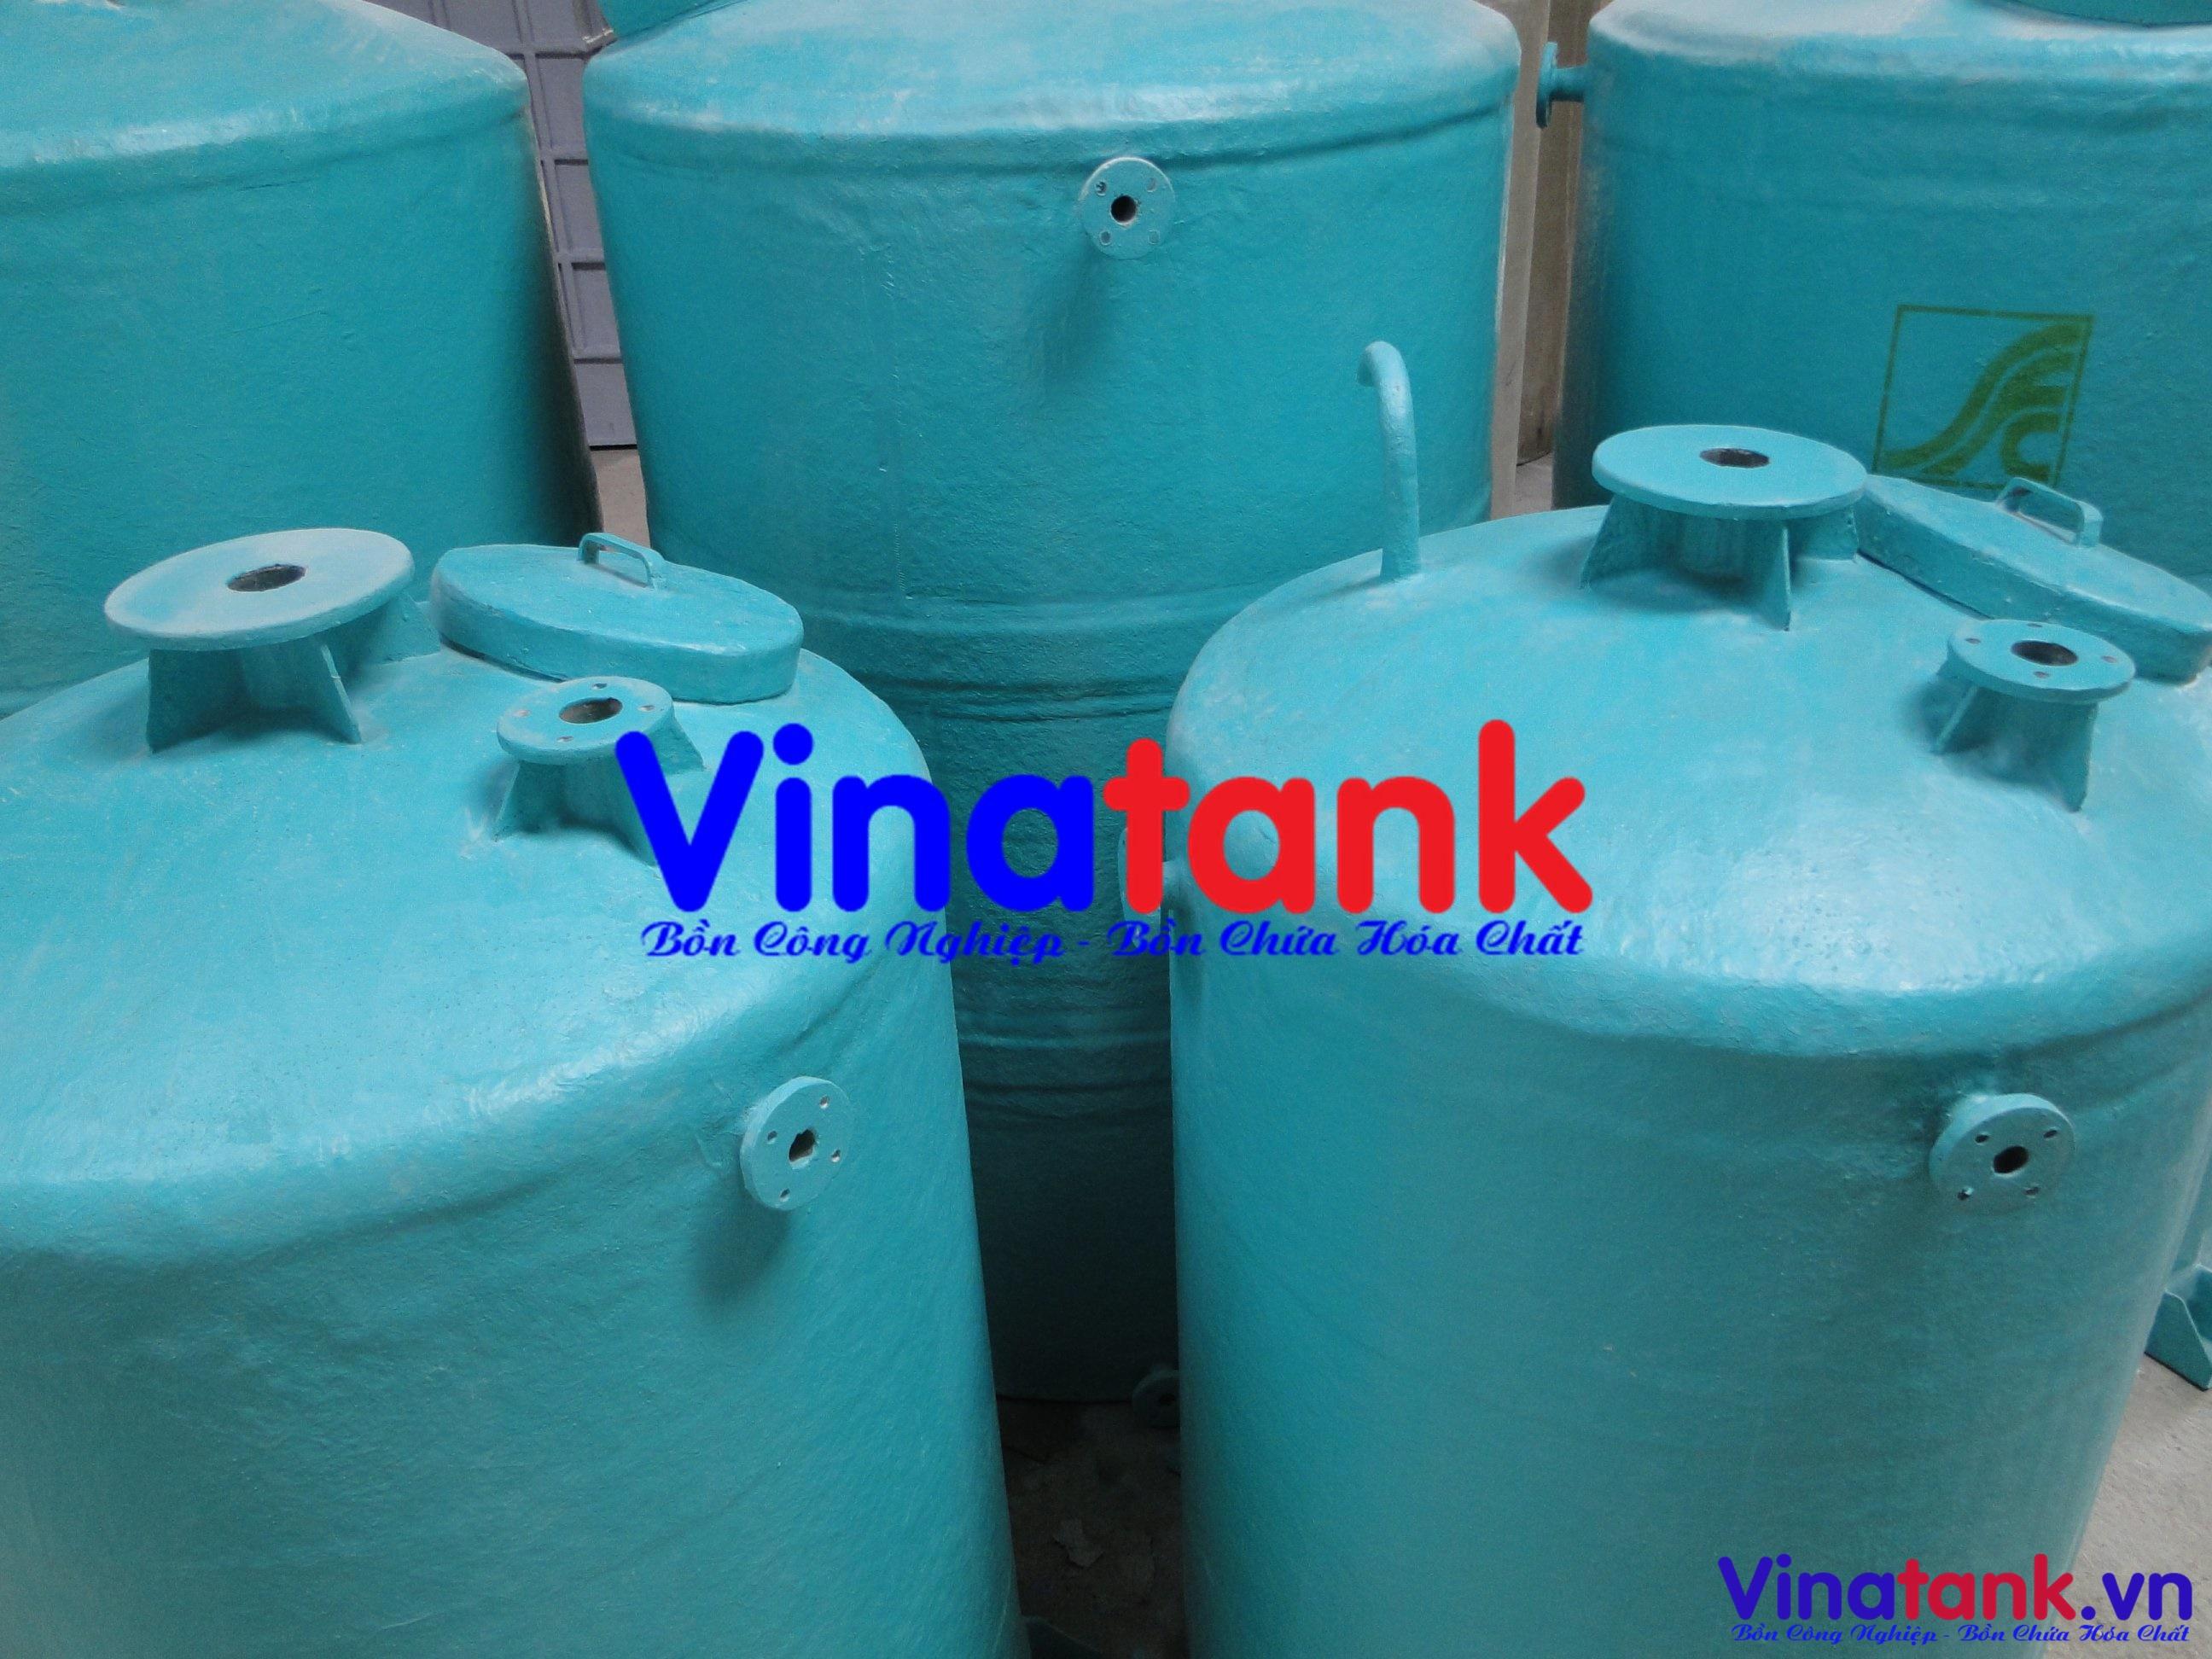 bồn composite chứa hóa chất, bon frp chua hoa chat, bồn chứa hóa chất, be chua hoa chat